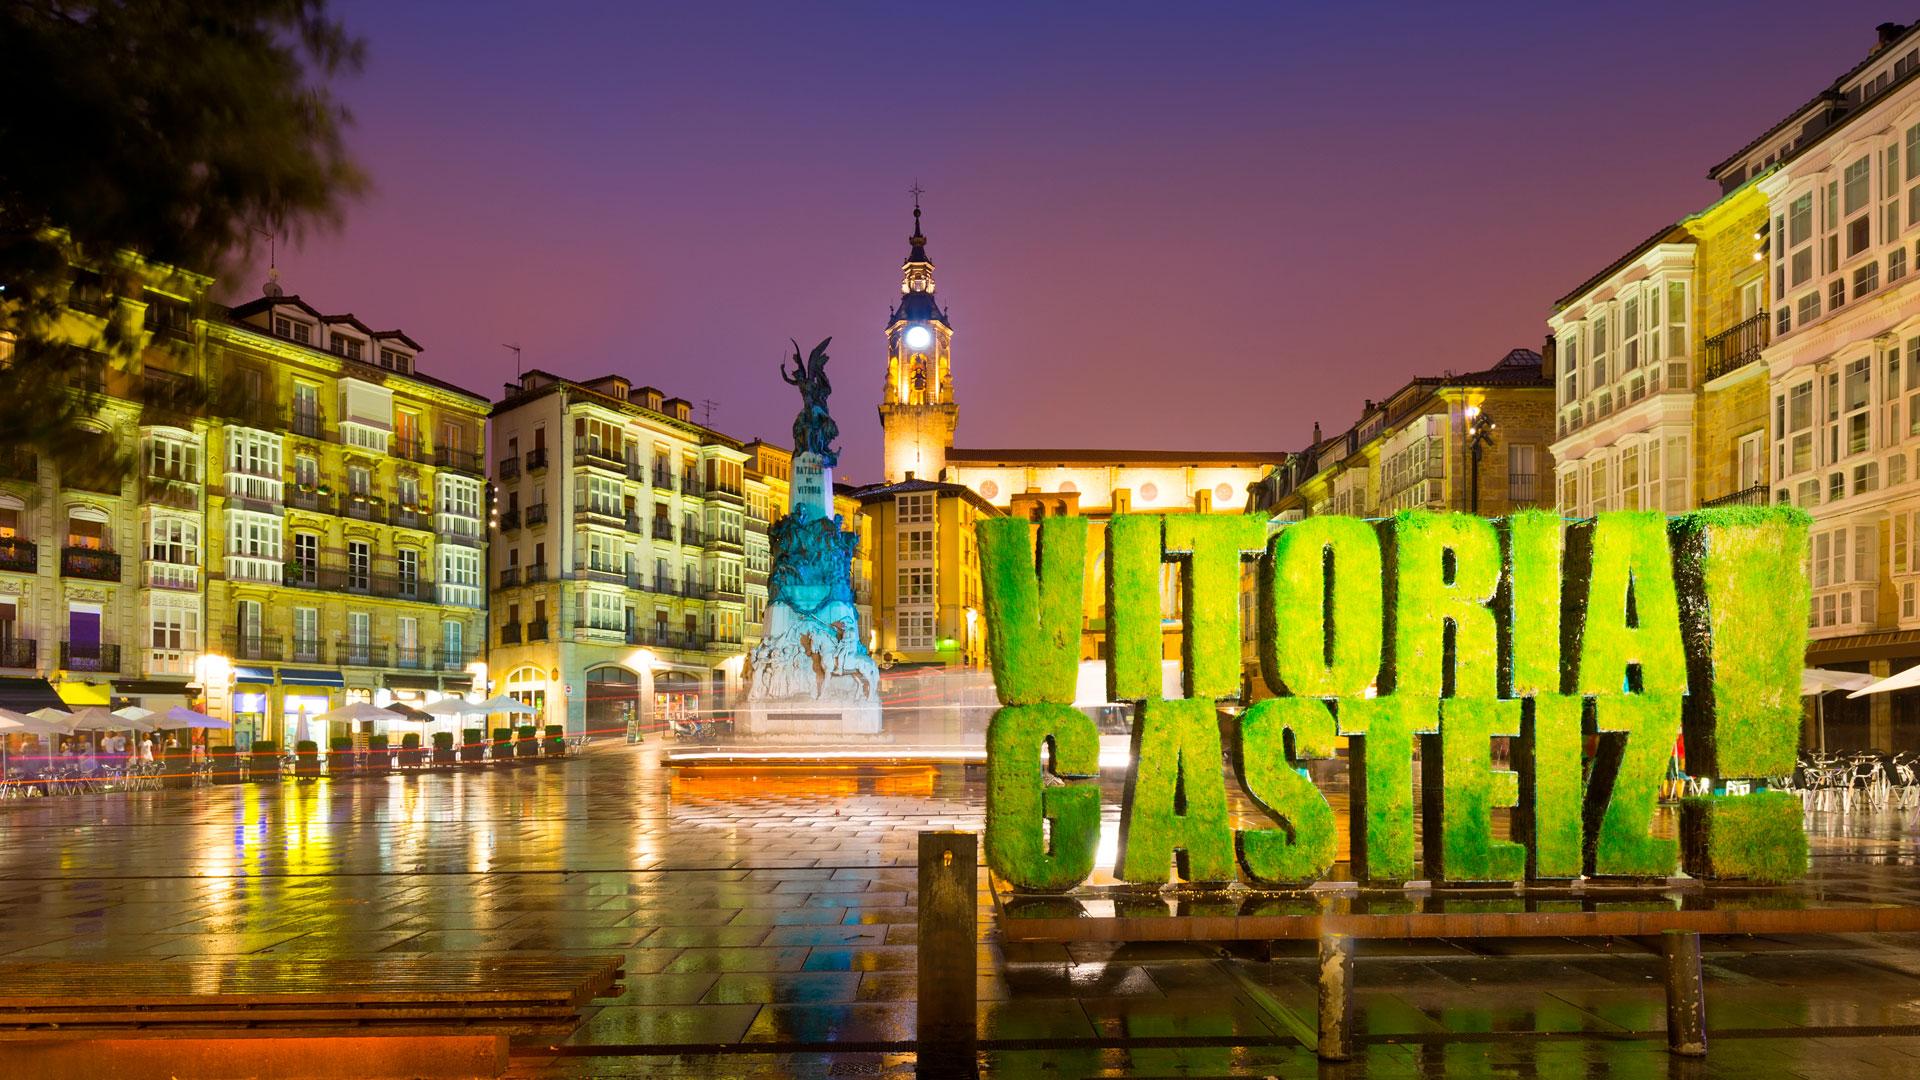 Vitoria Gasteiz verde reciclaje hero asset